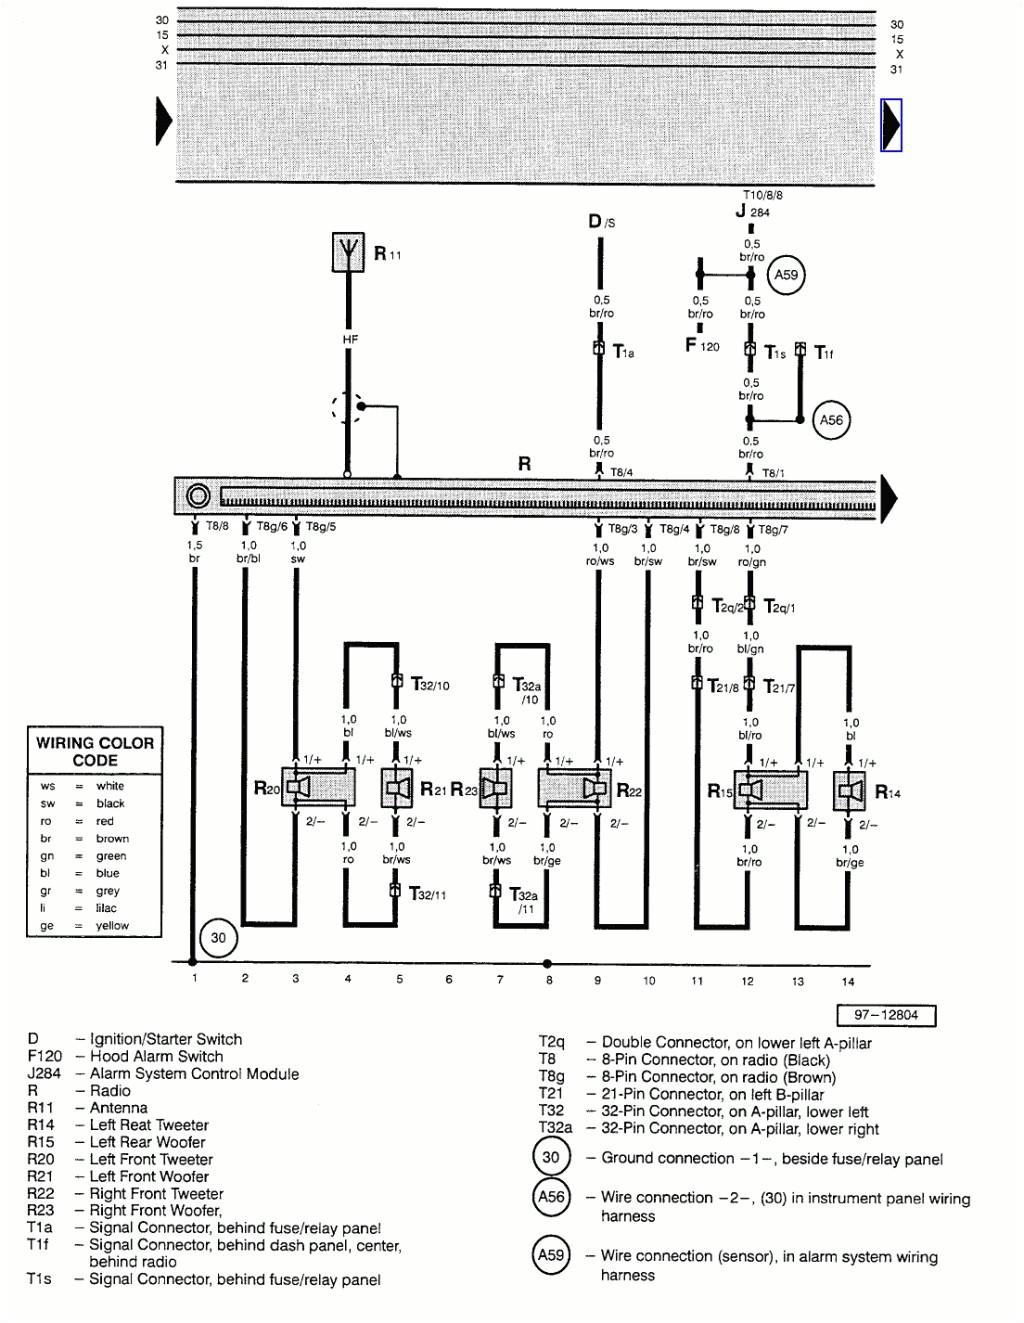 98 gti wiring diagram wiring diagram name 98 gti wiring diagram